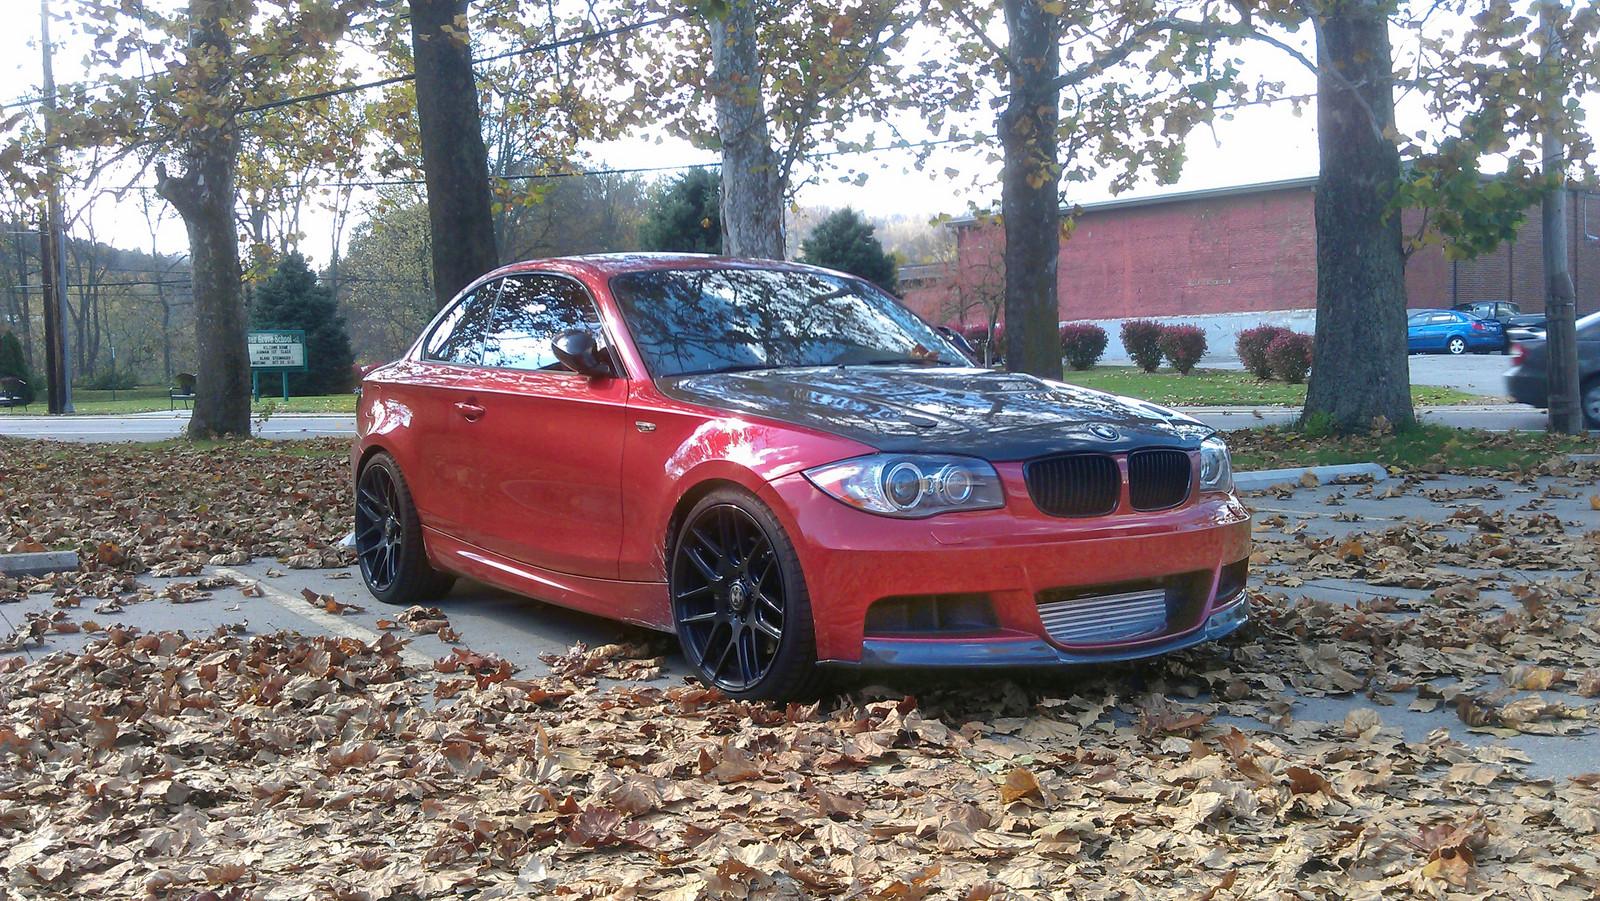 2008 BMW 135i 1 4 mile Drag Racing timeslip specs 0 60